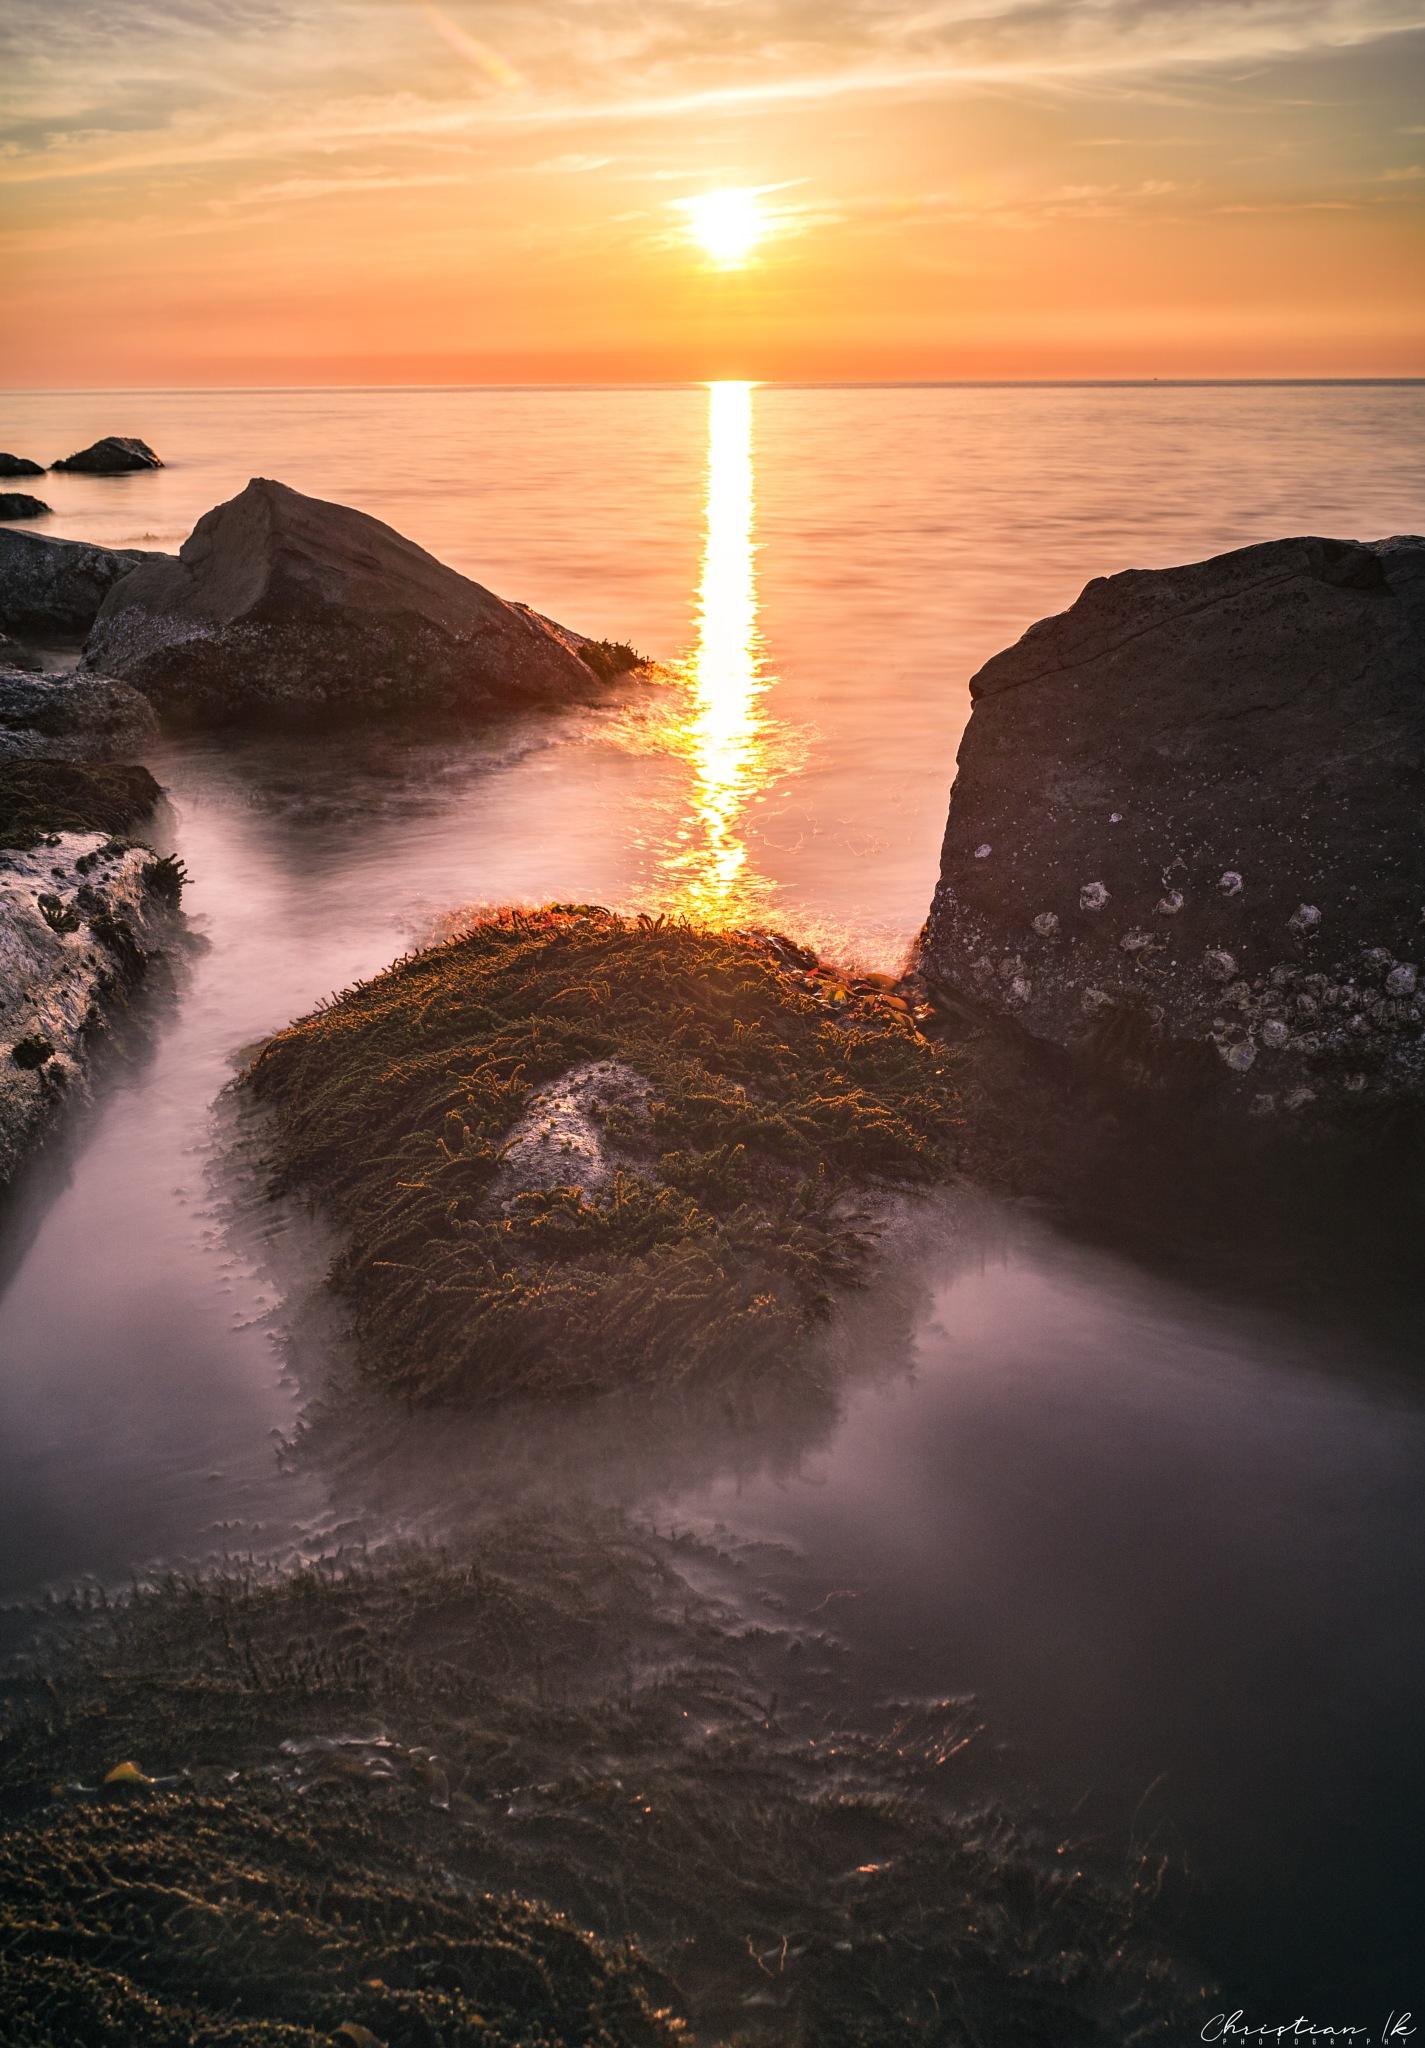 Sunlight by Christian